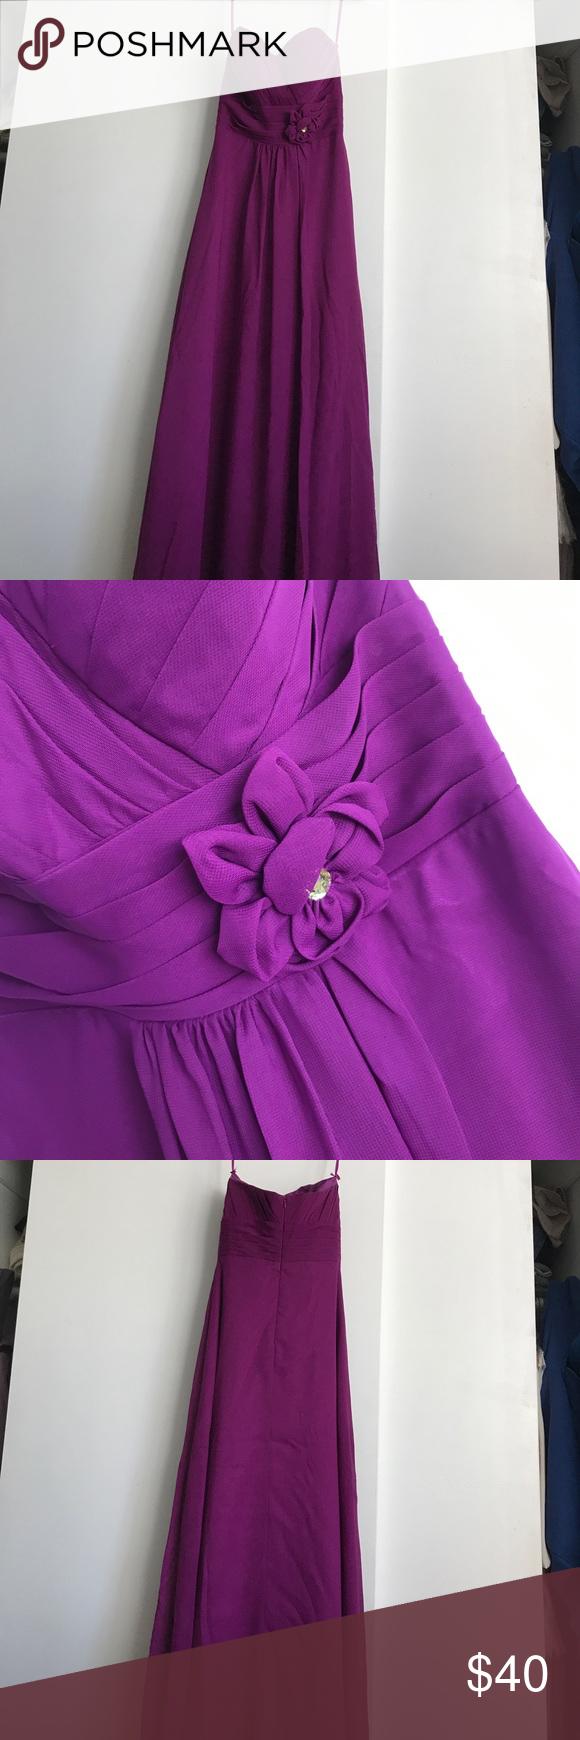 Purple long prom dress size